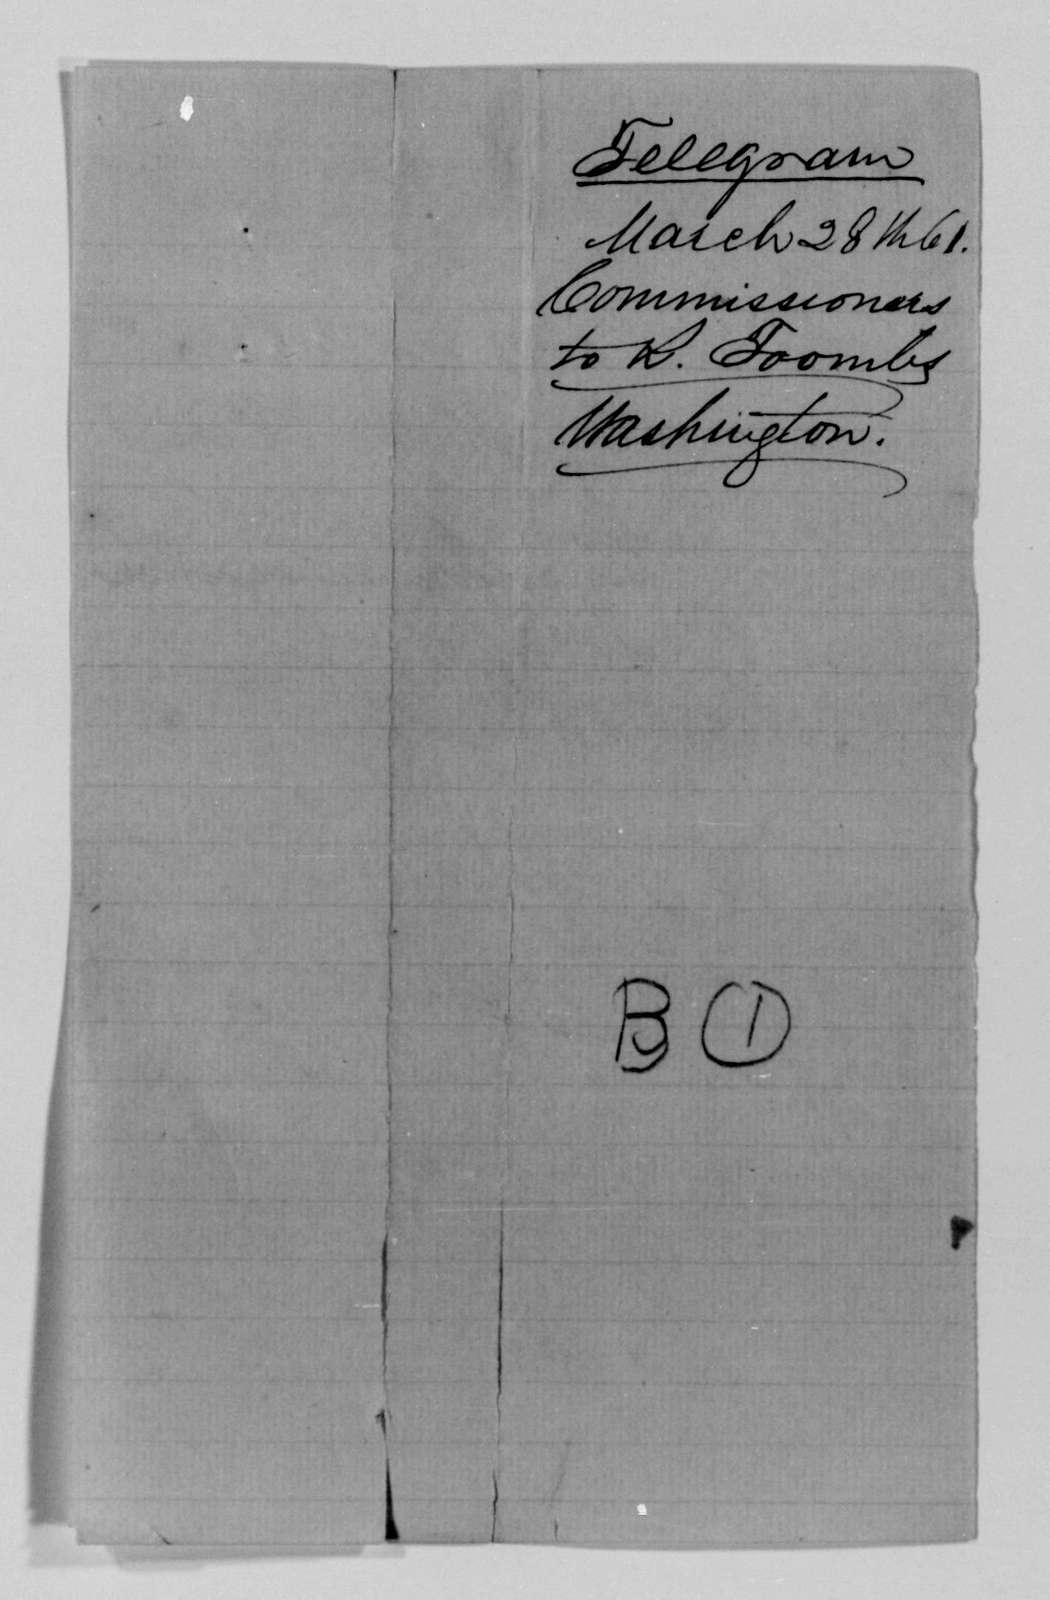 Confederate States of America records: Microfilm Reel 1